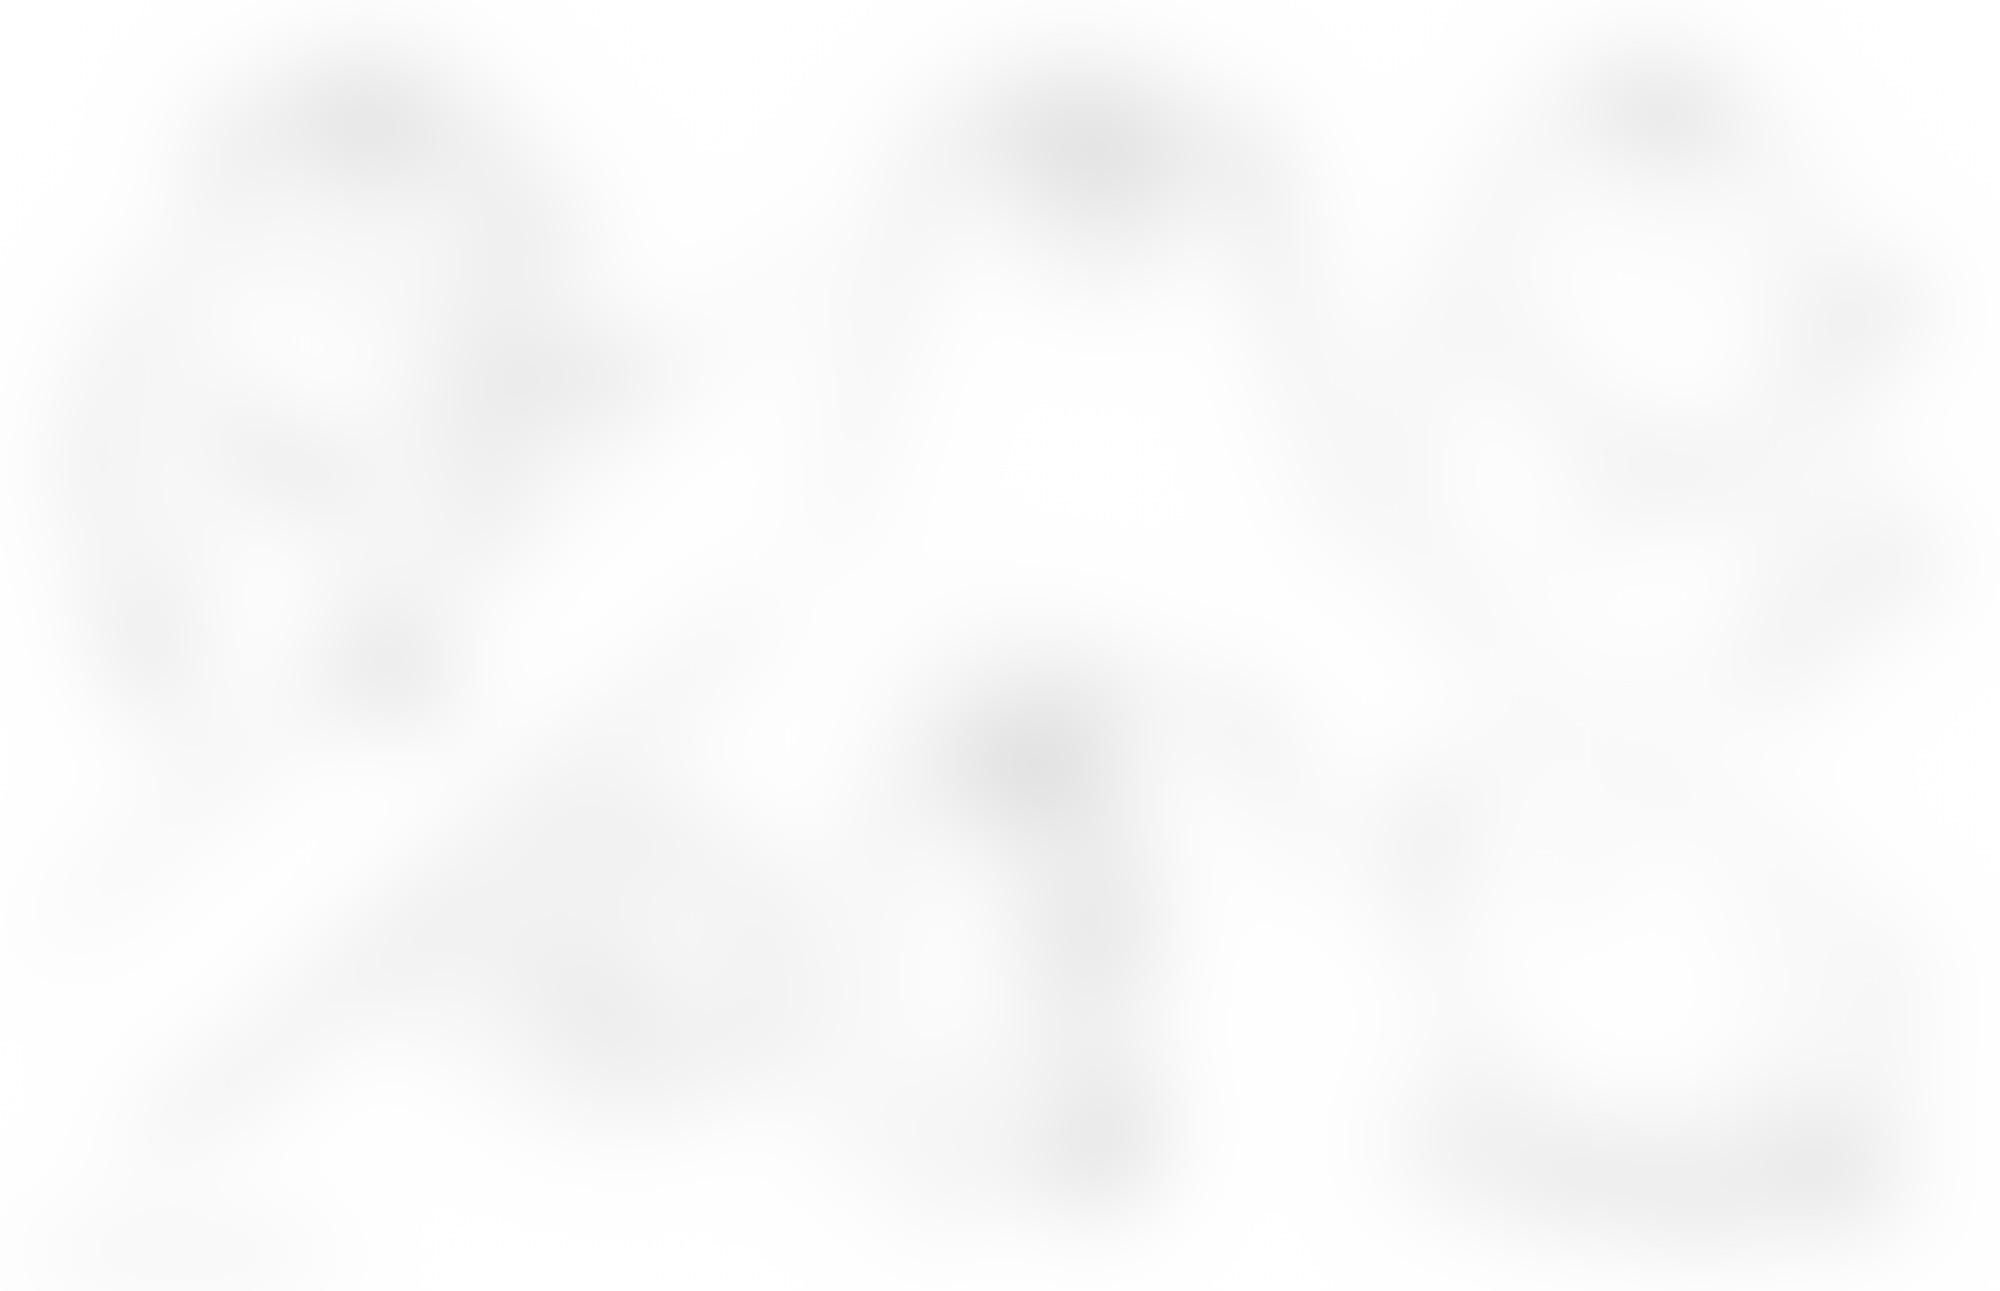 04 Goldilocks Marmoset autocompressfitresizeixlibphp 1 1 0max h2000max w3 D2000q80sc322bfa34e90166ae7ce7f3832364dbd